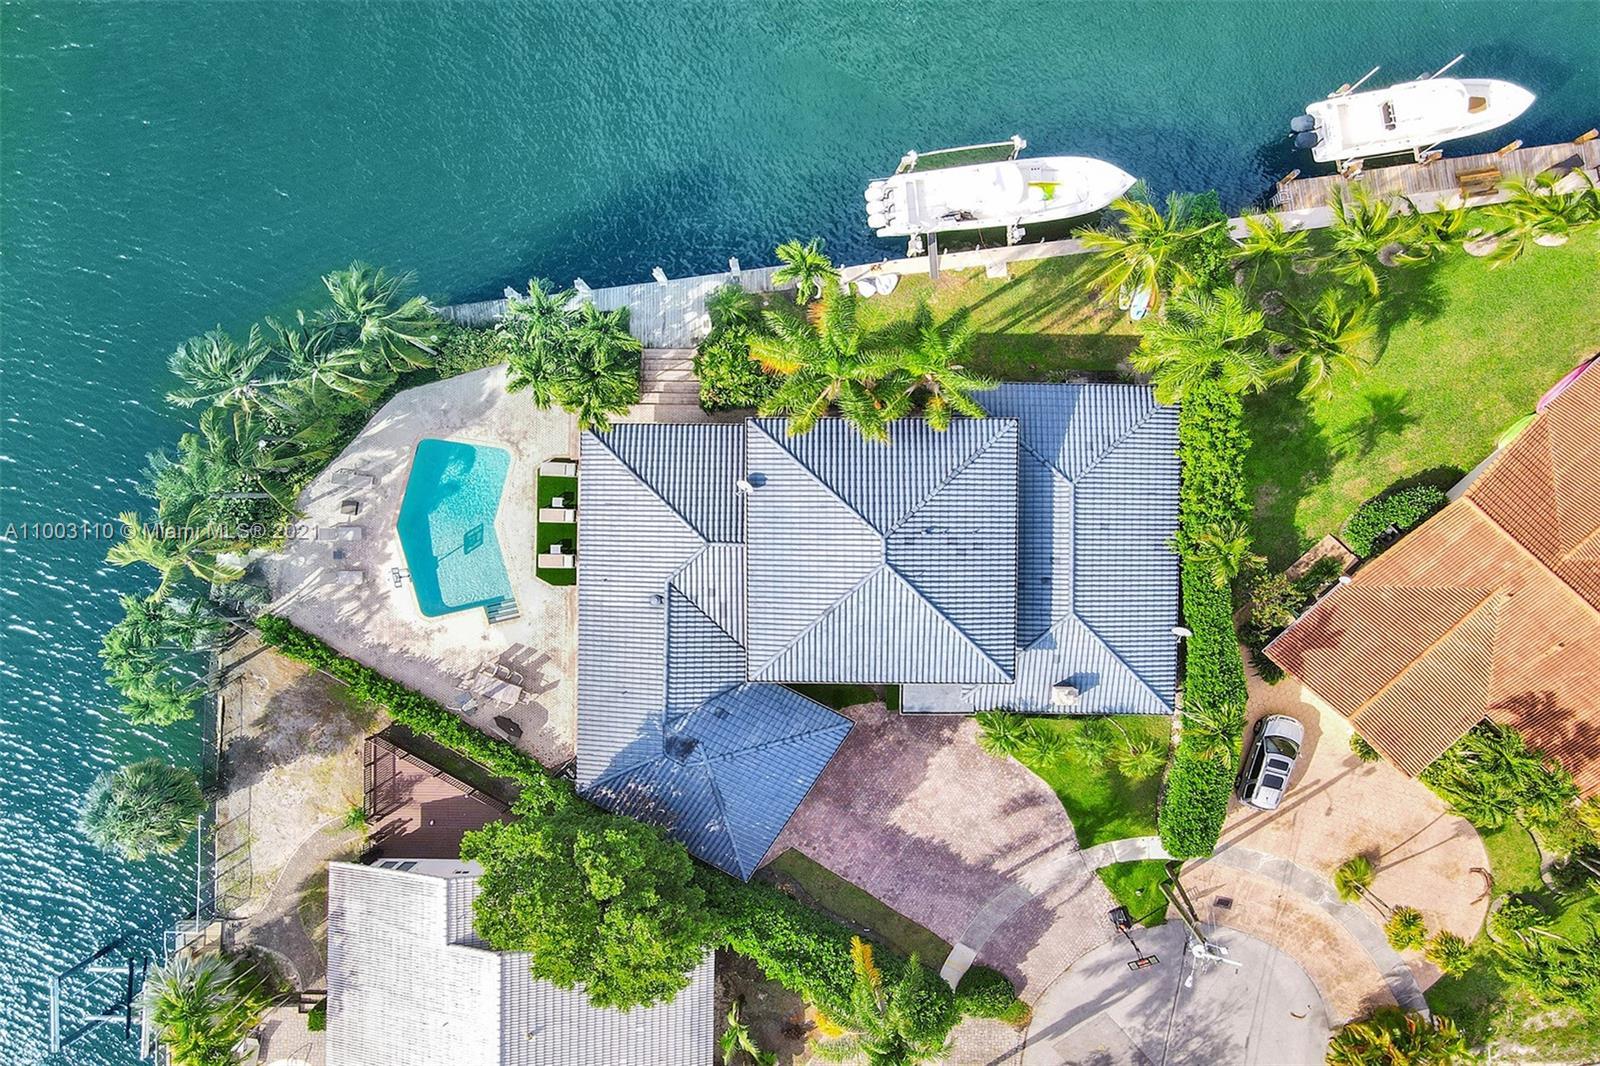 Keystone Point - 13300 Keystone Ter, North Miami, FL 33181